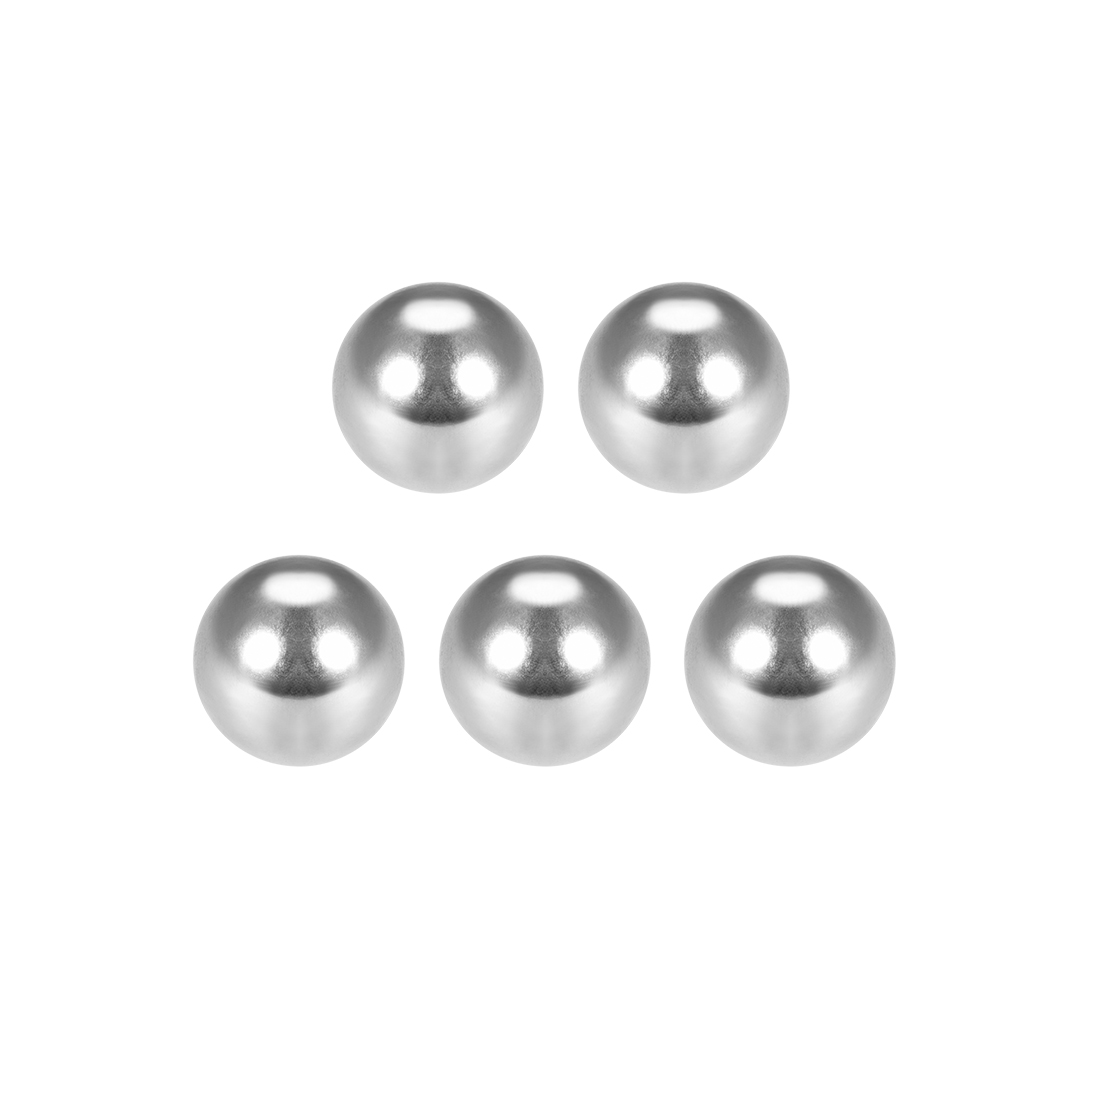 3/4 Inch Precision Chrome Steel Bearing Balls G25 5pcs